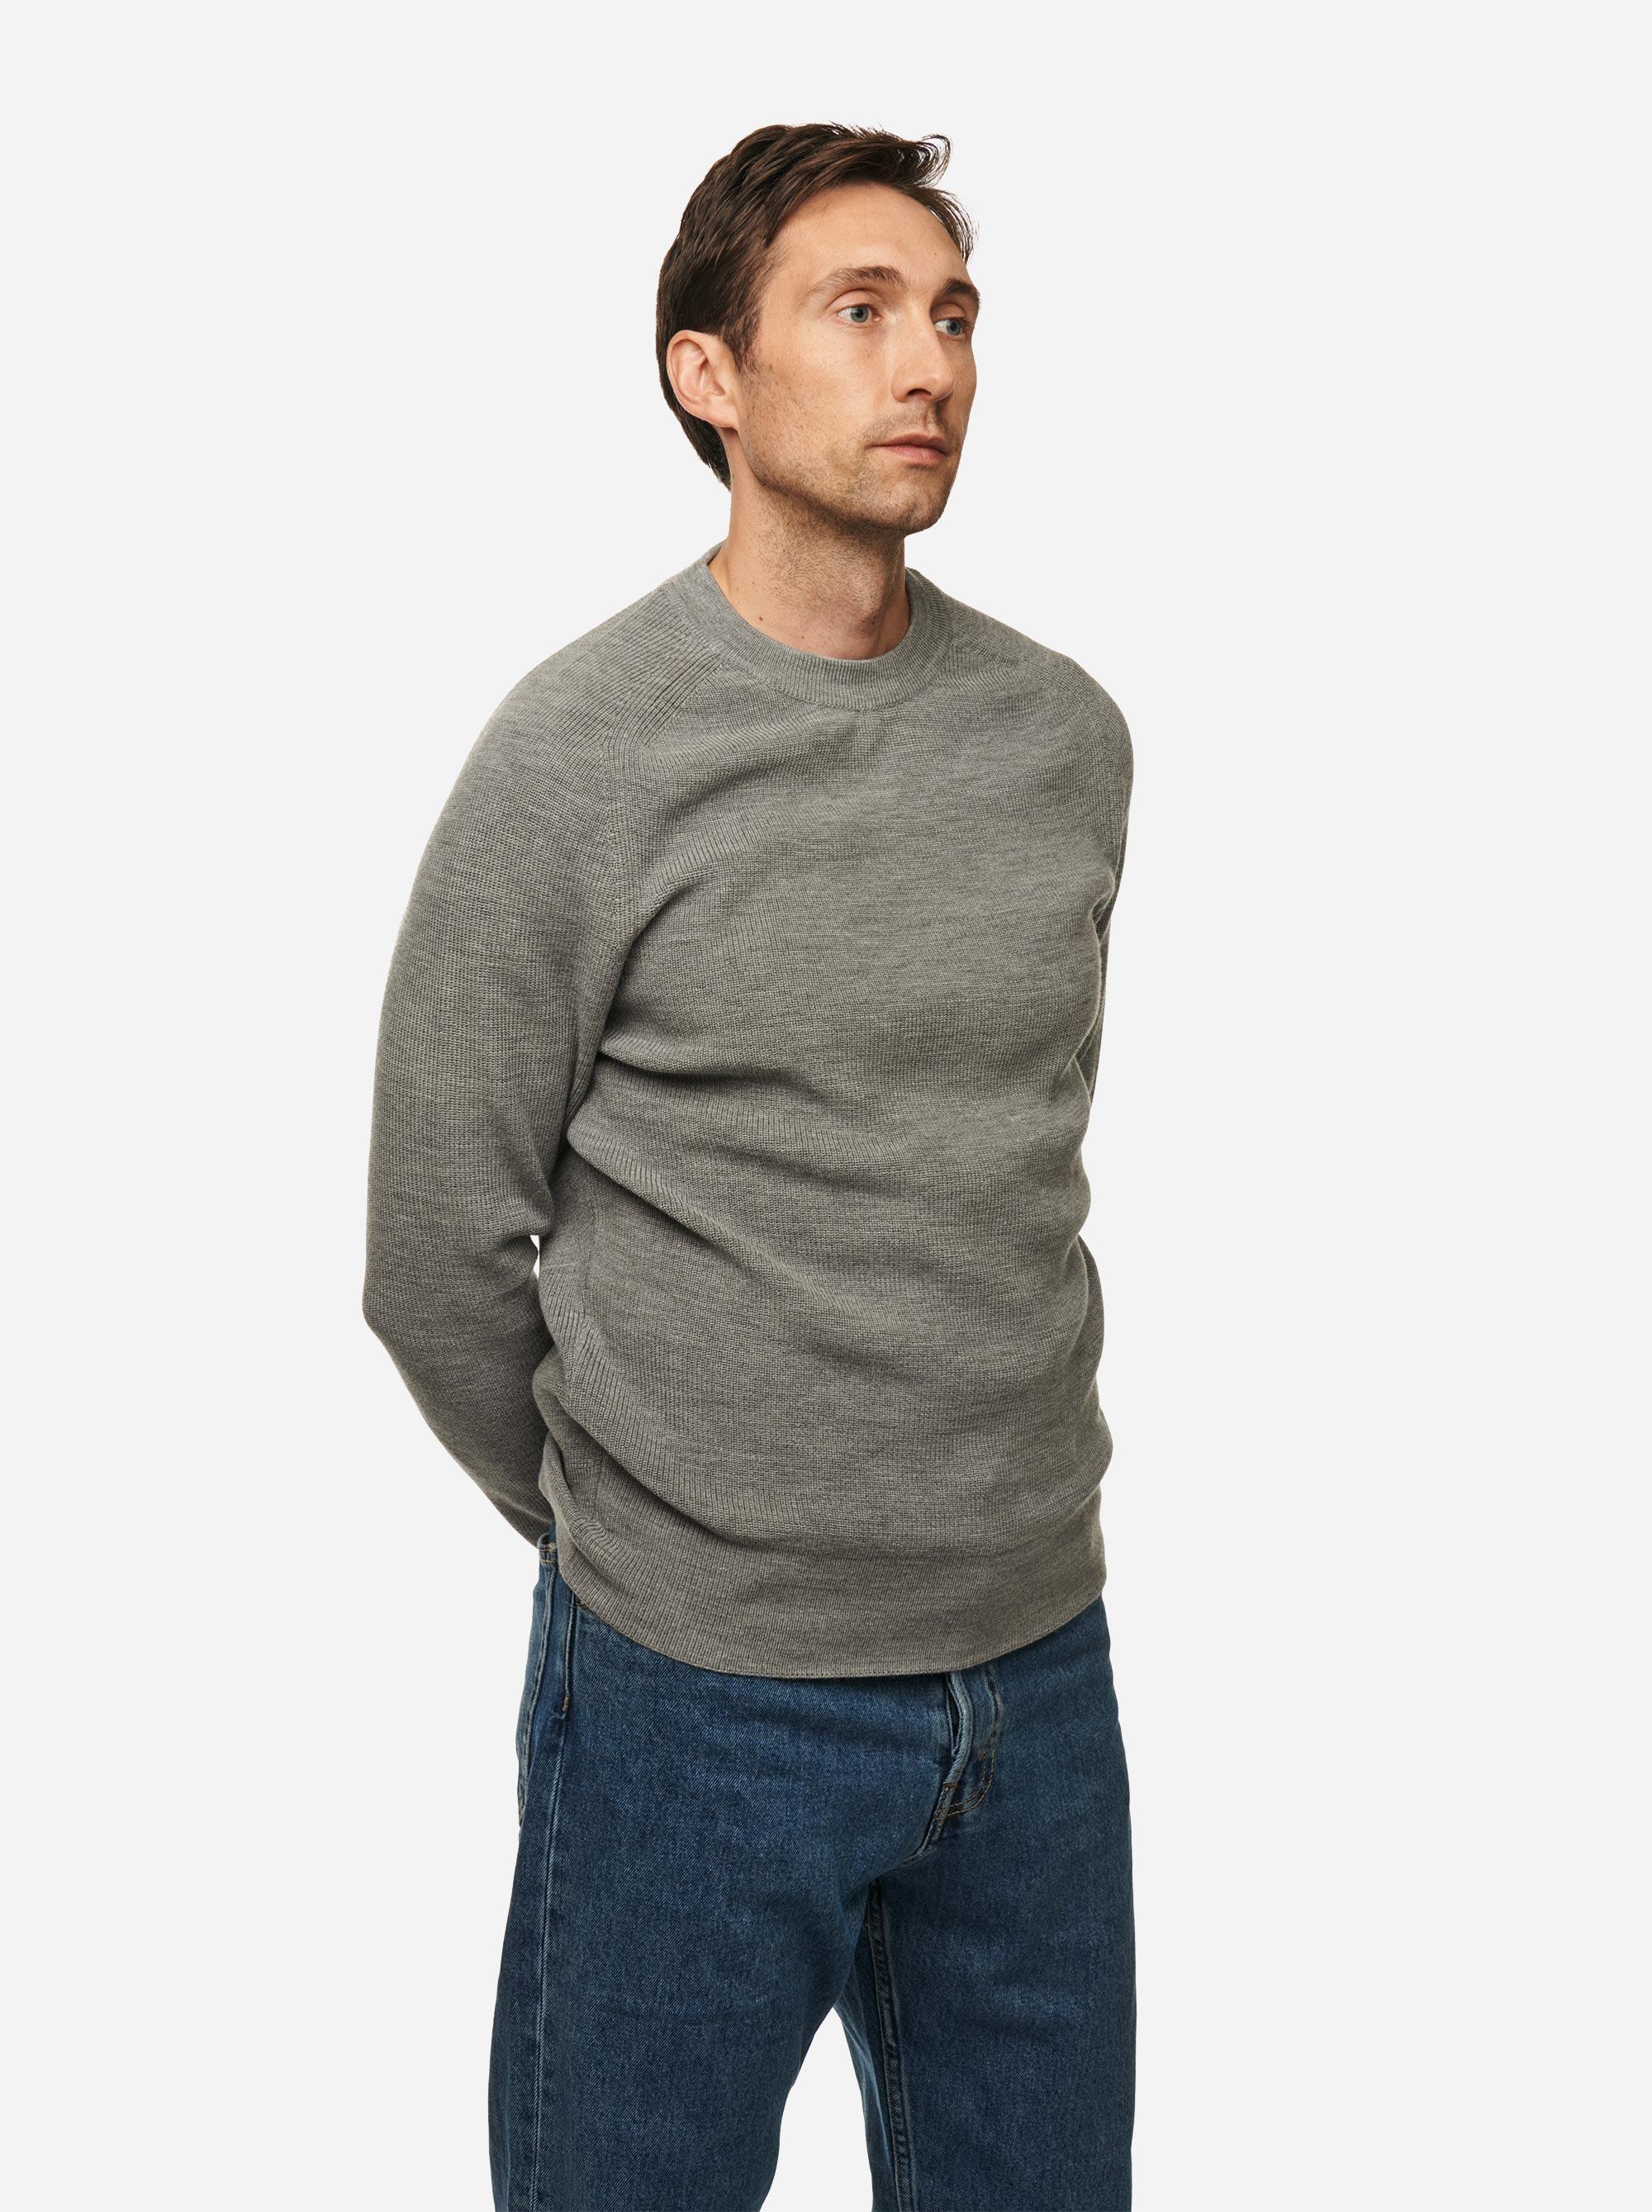 Teym - Crewneck - The Merino Sweater - Men - Grey - 2